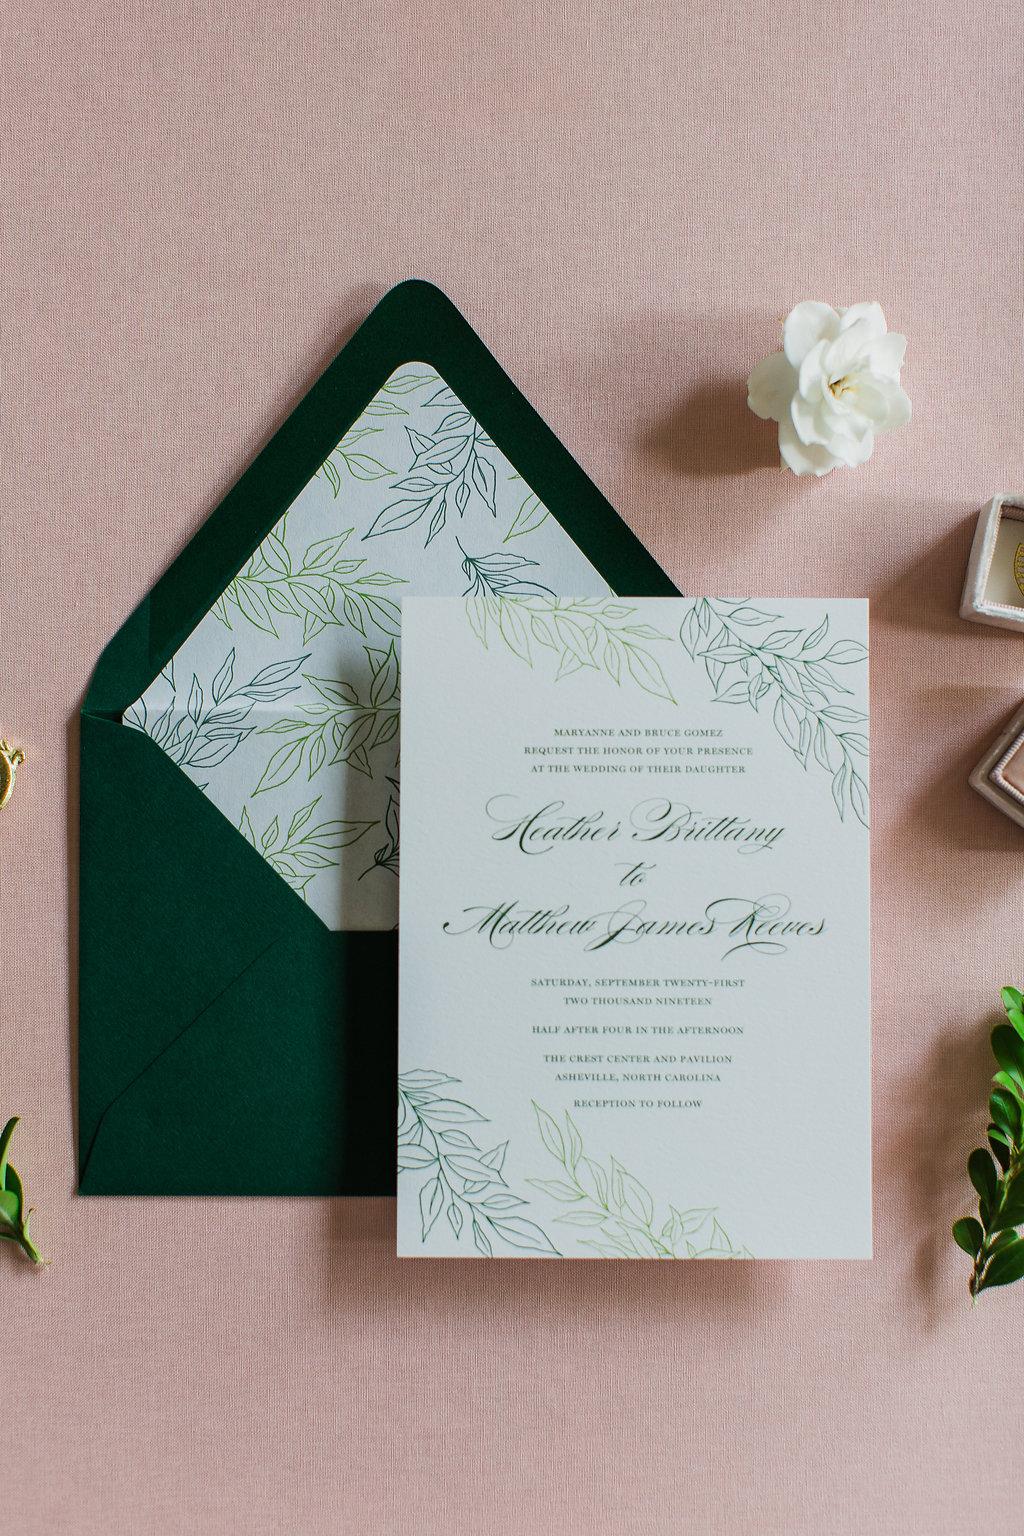 Heather Hand Drawn Wedding Invitation Greenery Feathered Heart PrintsFHP-36.jpg